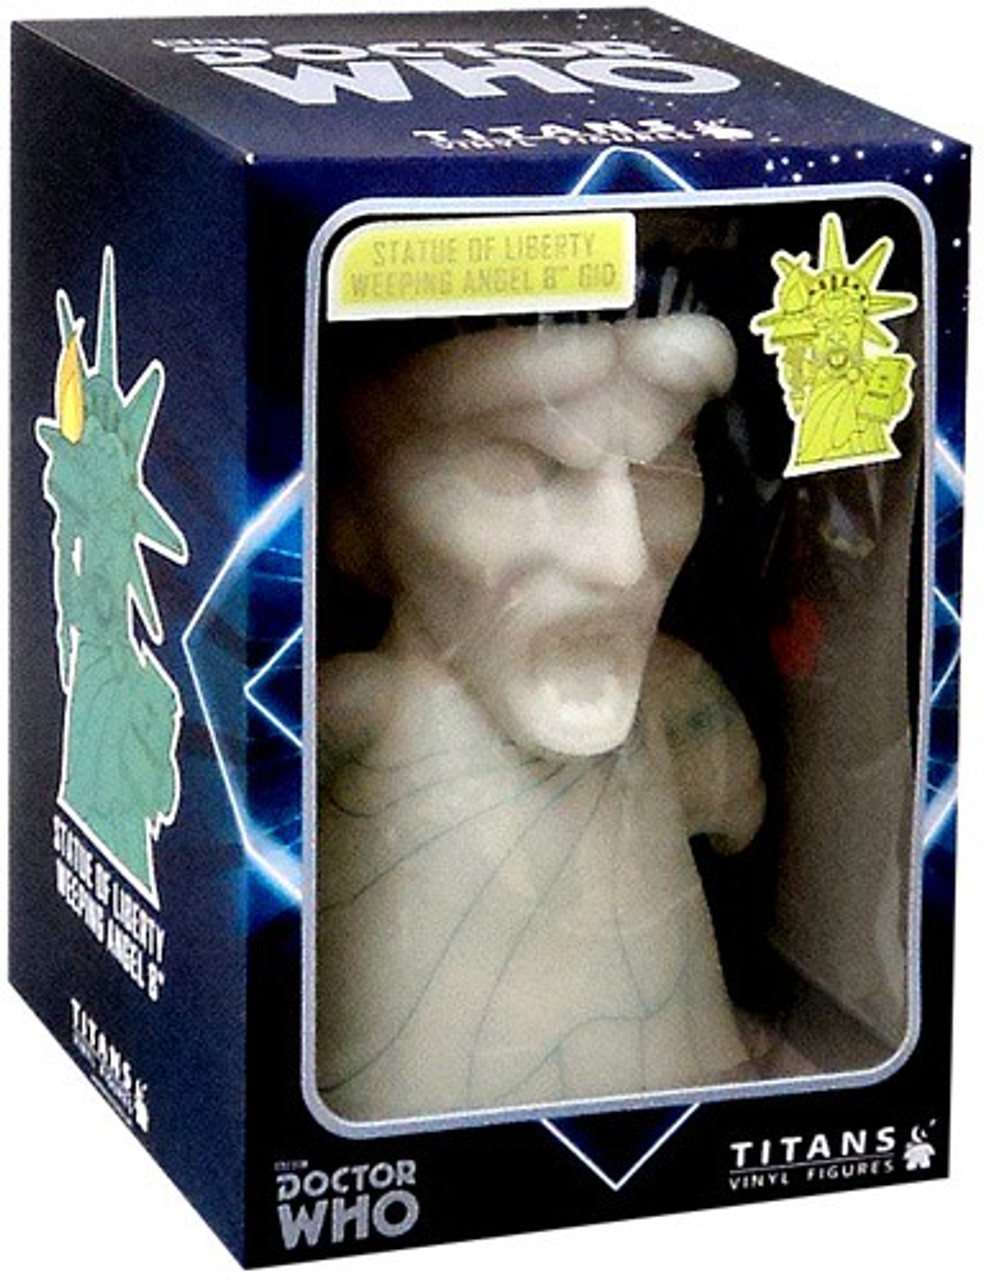 Doctor Who Weeping Angel Exclusive 8-Inch Vinyl Figure [Statue of Liberty]